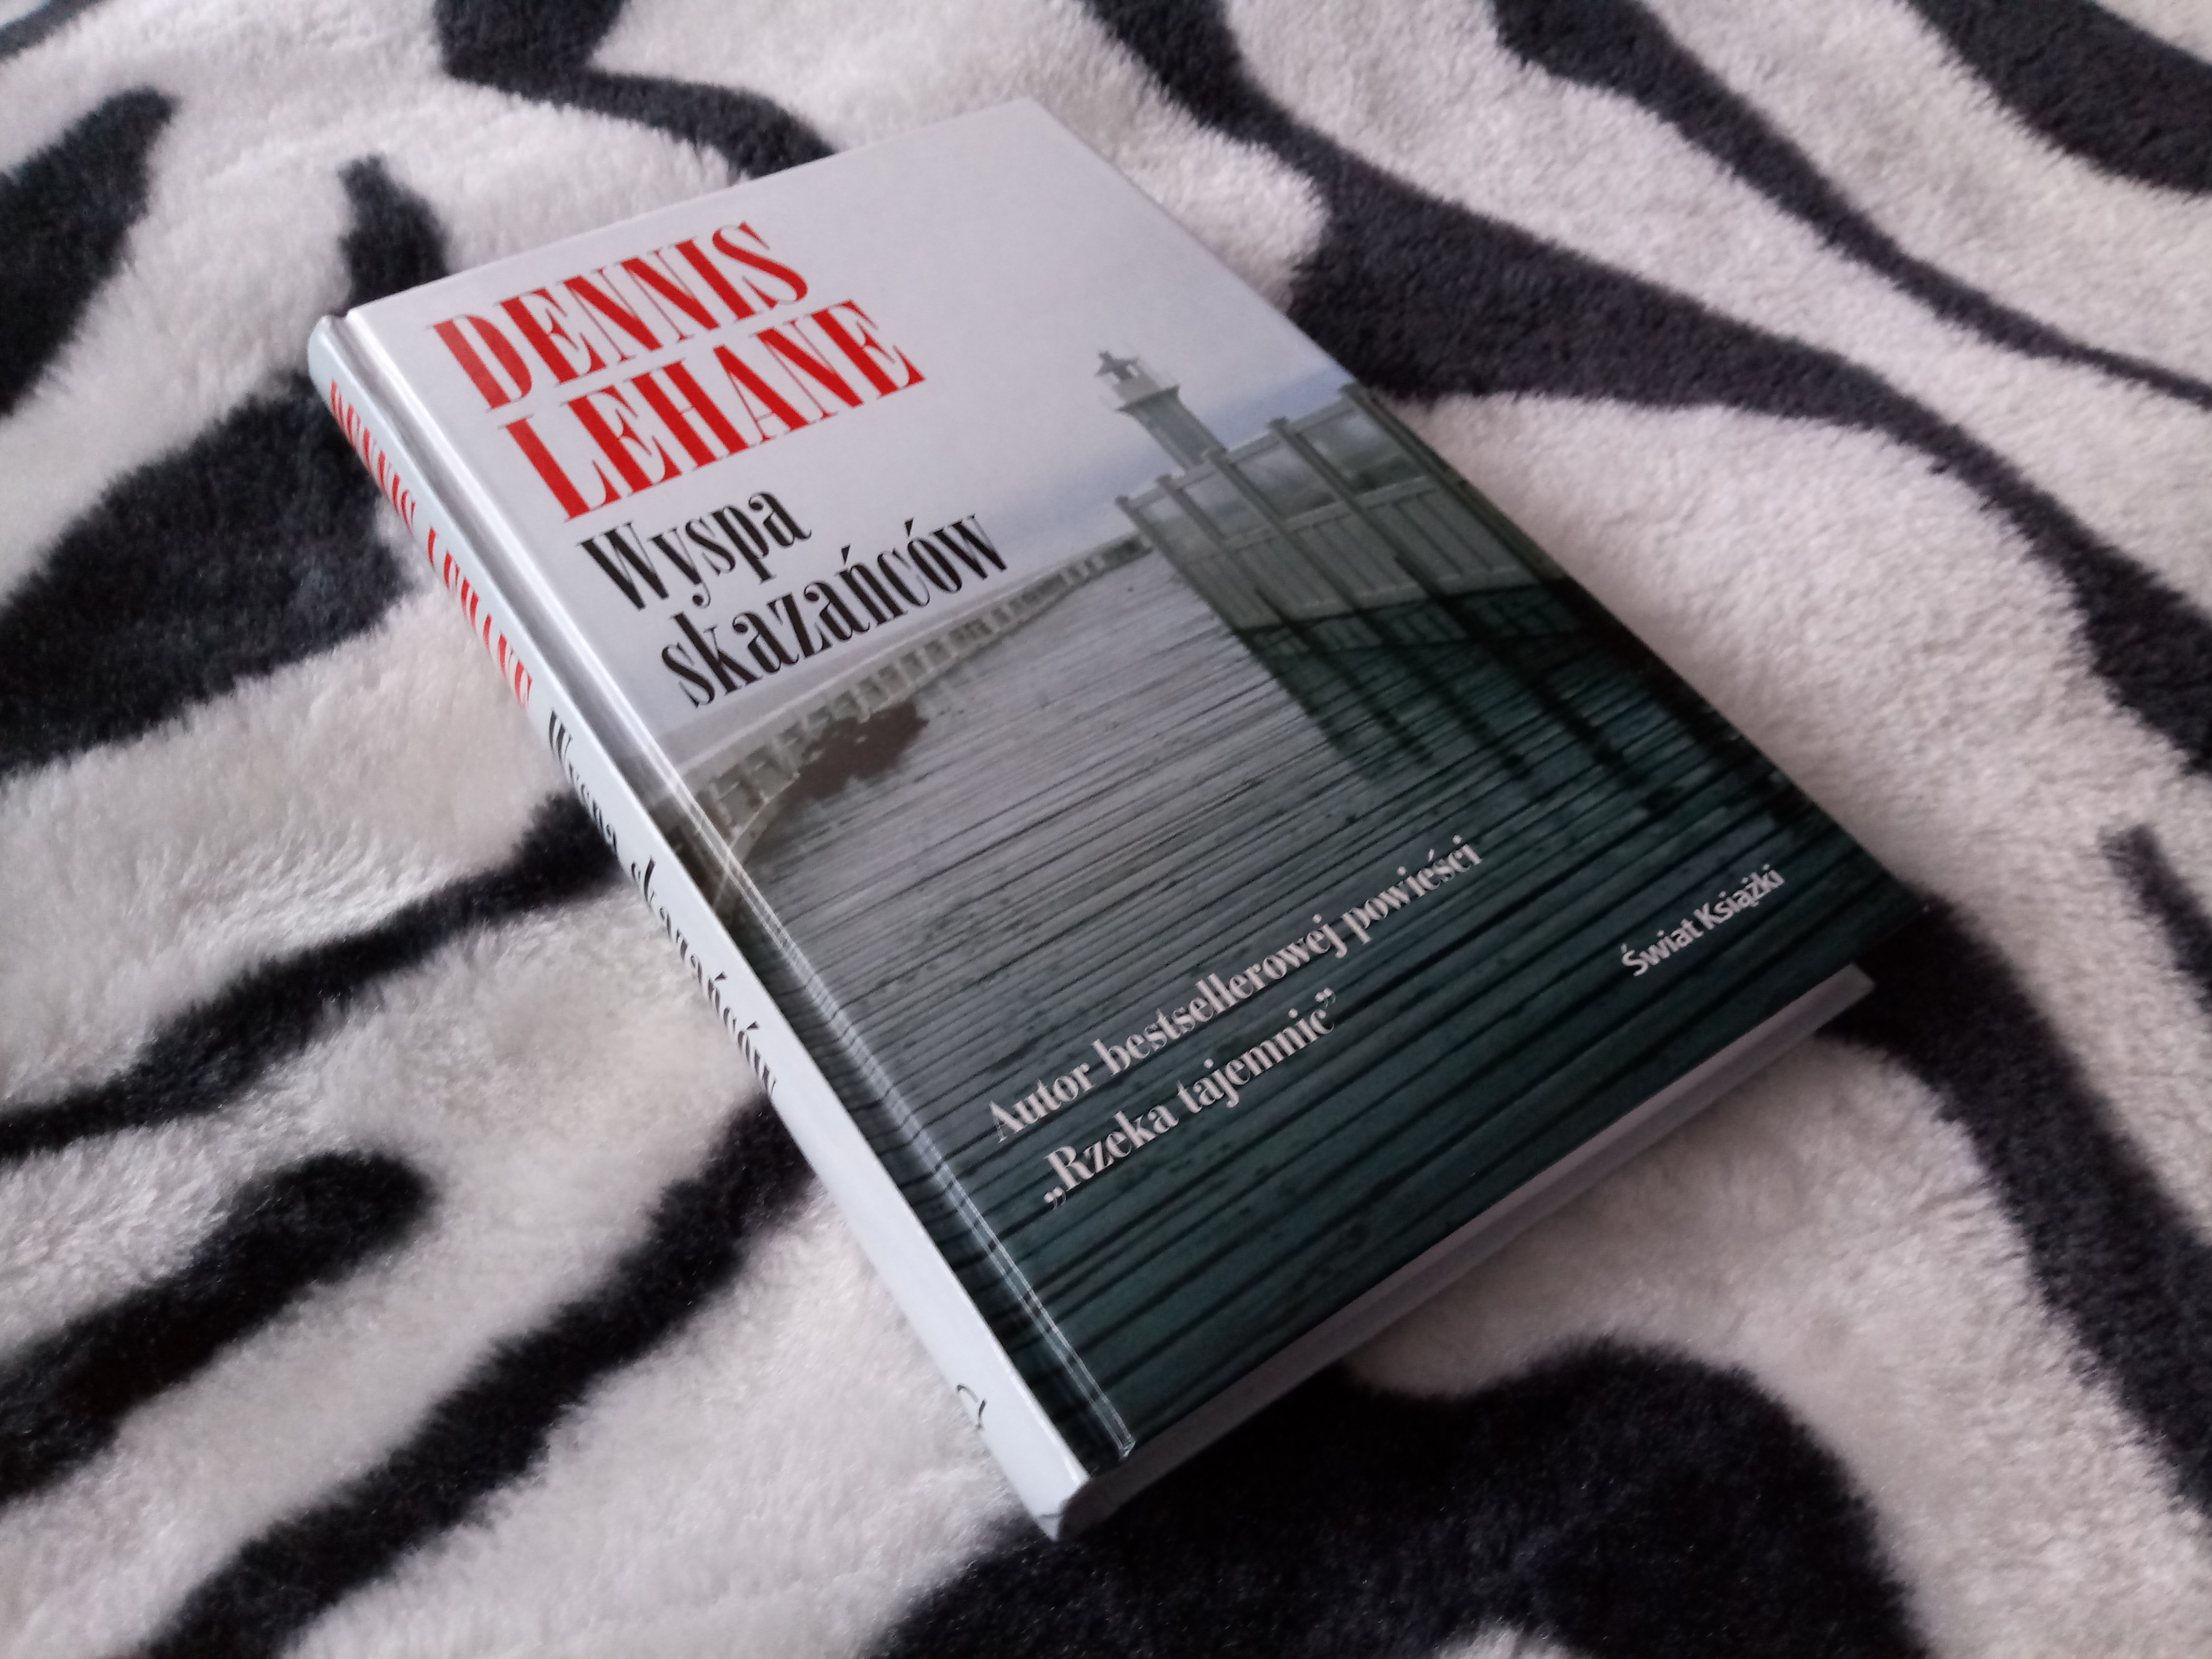 Wyspa skazańców – Dennis Lehane